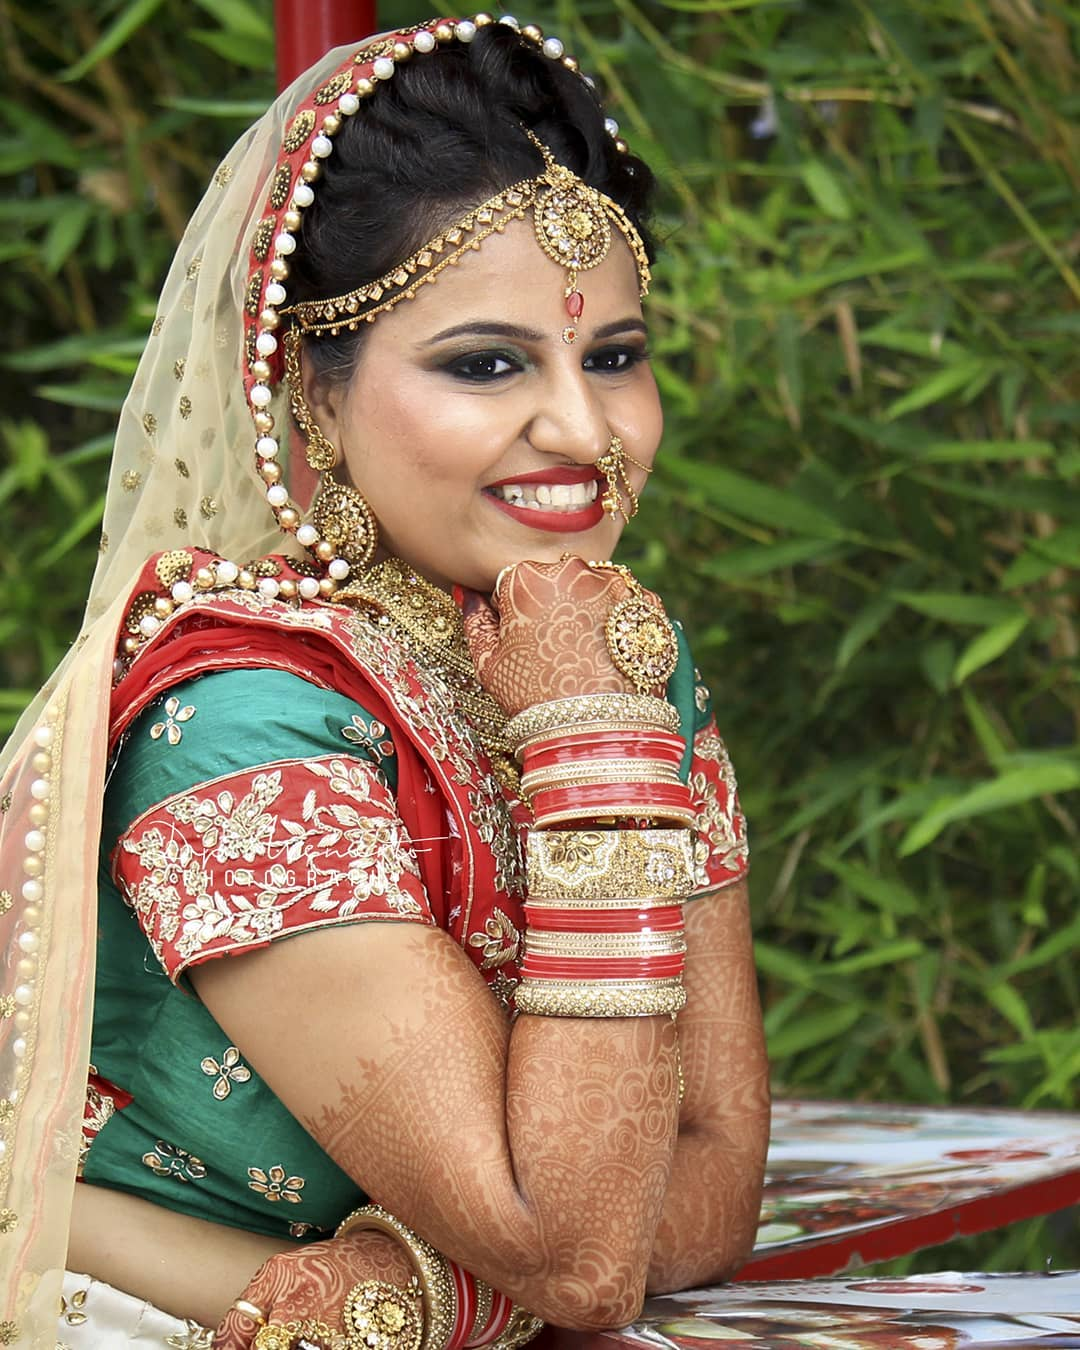 Happy Bride. ✨✨✨✨✨✨✨✨✨✨✨✨✨✨✨✨✨ Wedding Portraits Shoot:#dipmementophotography@dip_memento_photography @dipthakkar.clickerhttps://www.facebook.com/photographybydip/✨✨✨✨✨✨✨✨✨✨✨✨✨✨✨✨✨#india#indian#photo#photography#photographer#pic#storiesofindia#candidshoot#indianphotography#indianphotographers#canvasofindia#weddingportrait#streetphotographyindia#ahmedabad#oph#official_photographers_hub#indianshutterbugs#indiaclicks#_coi#india_everyday#i_hobbygraphy#igersoftheday#ahmedabad_diaries#dslr_official#weddingphotographer#indianphotography#photographers_of_india#destinationwedding